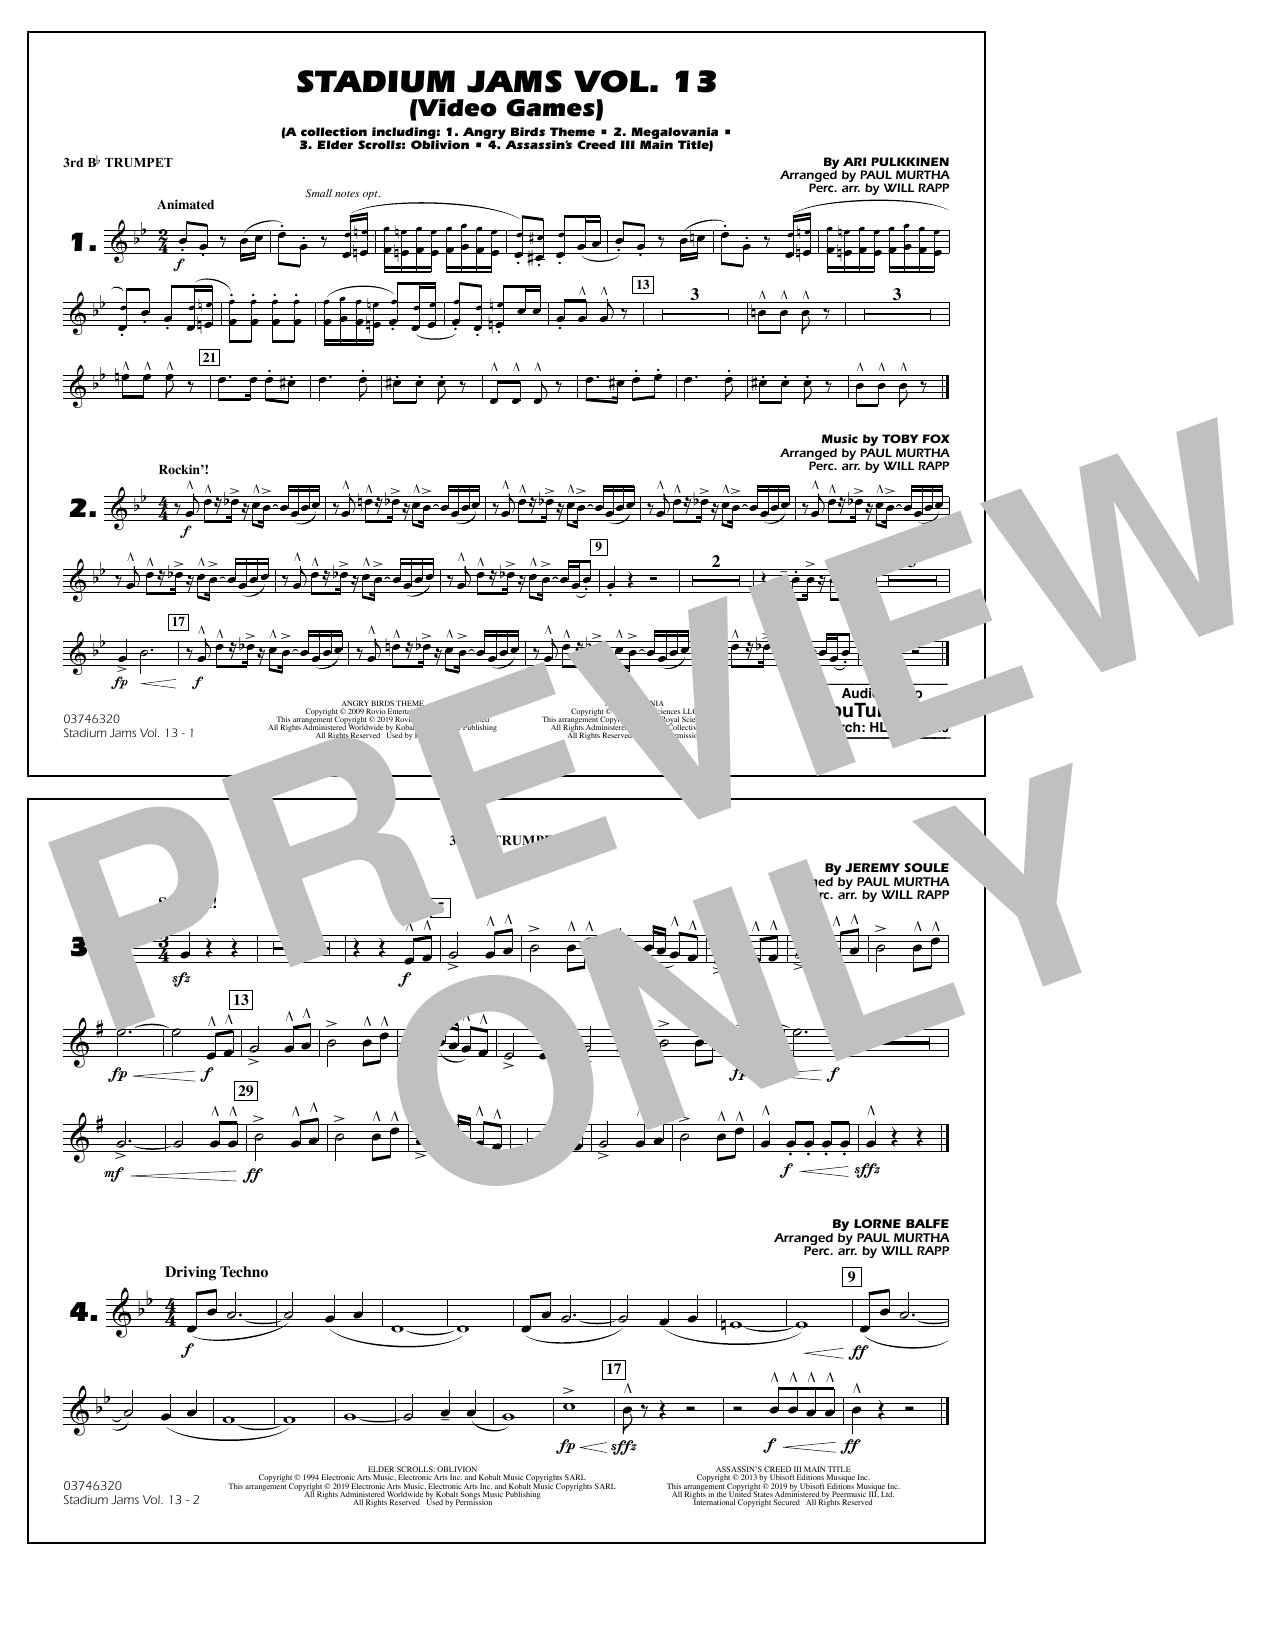 Stadium Jams Volume 13 (Video Games) - 3rd Bb Trumpet (Marching Band)